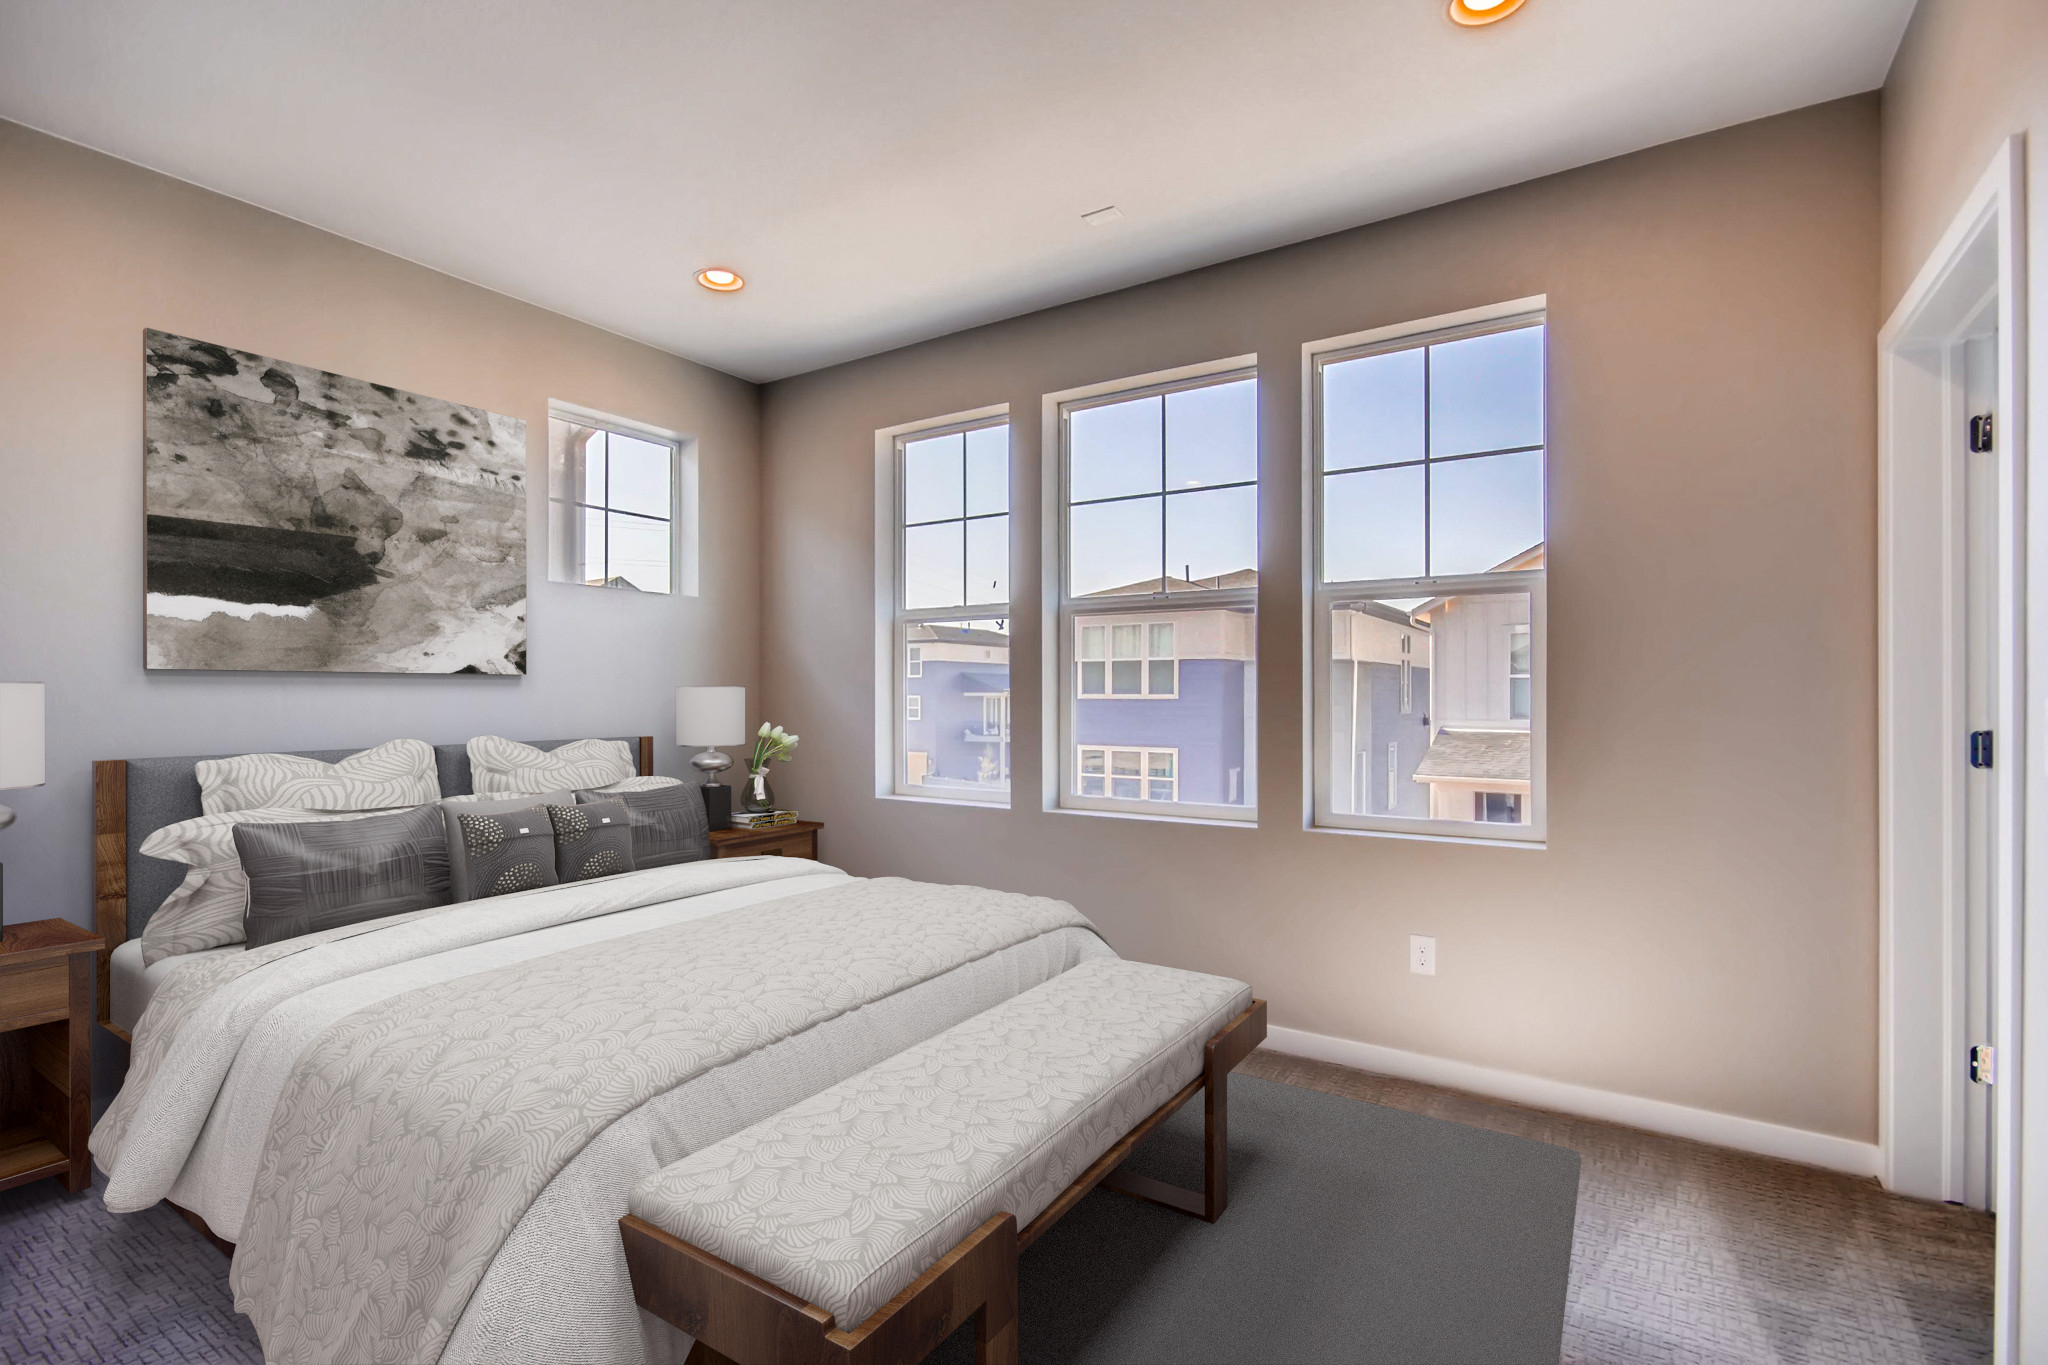 Crescendo at Central Park Plan 2204 Master Bedroom